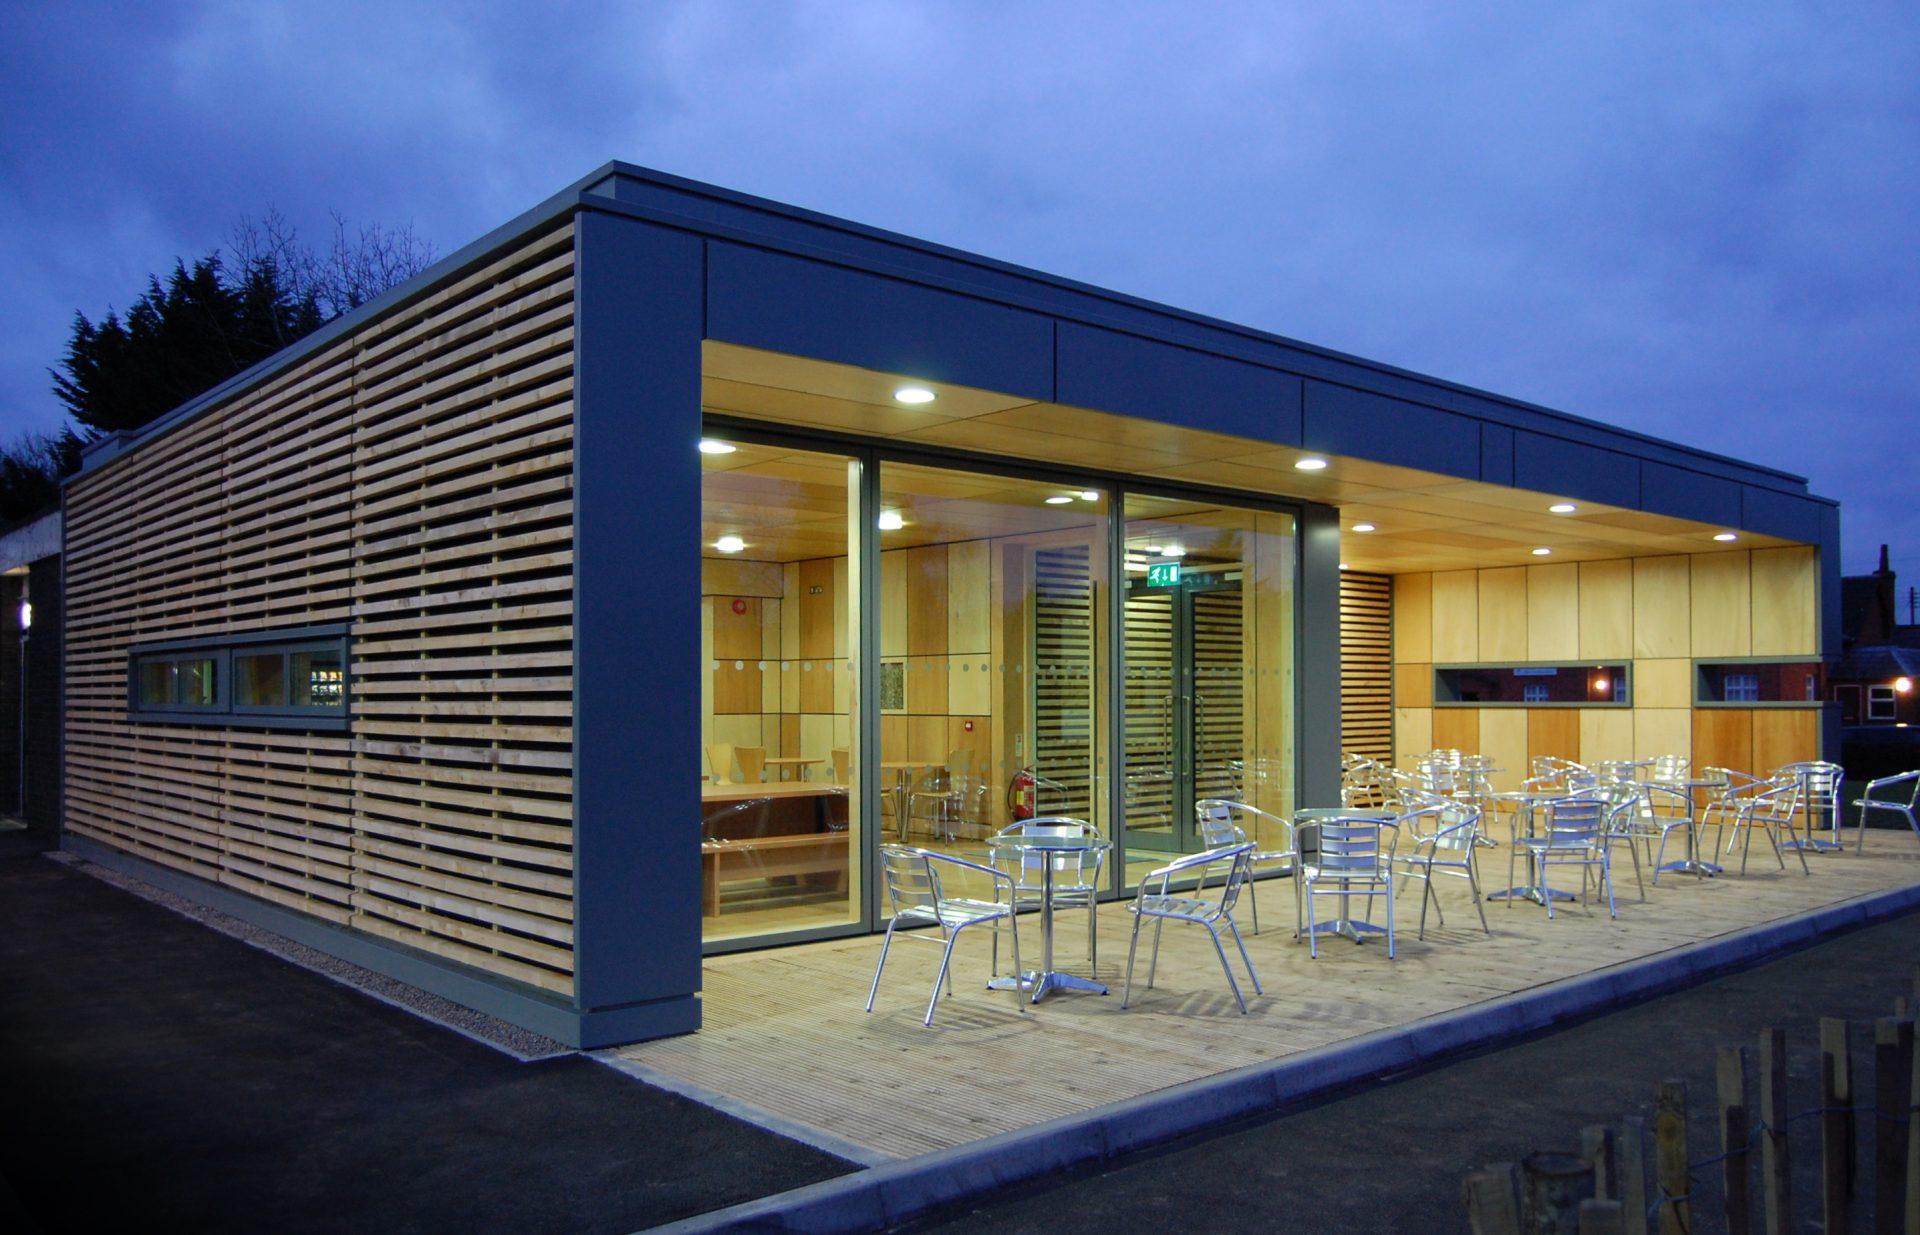 Straw Bale Cafe Exterior Plywood Cedar Velfac Decking